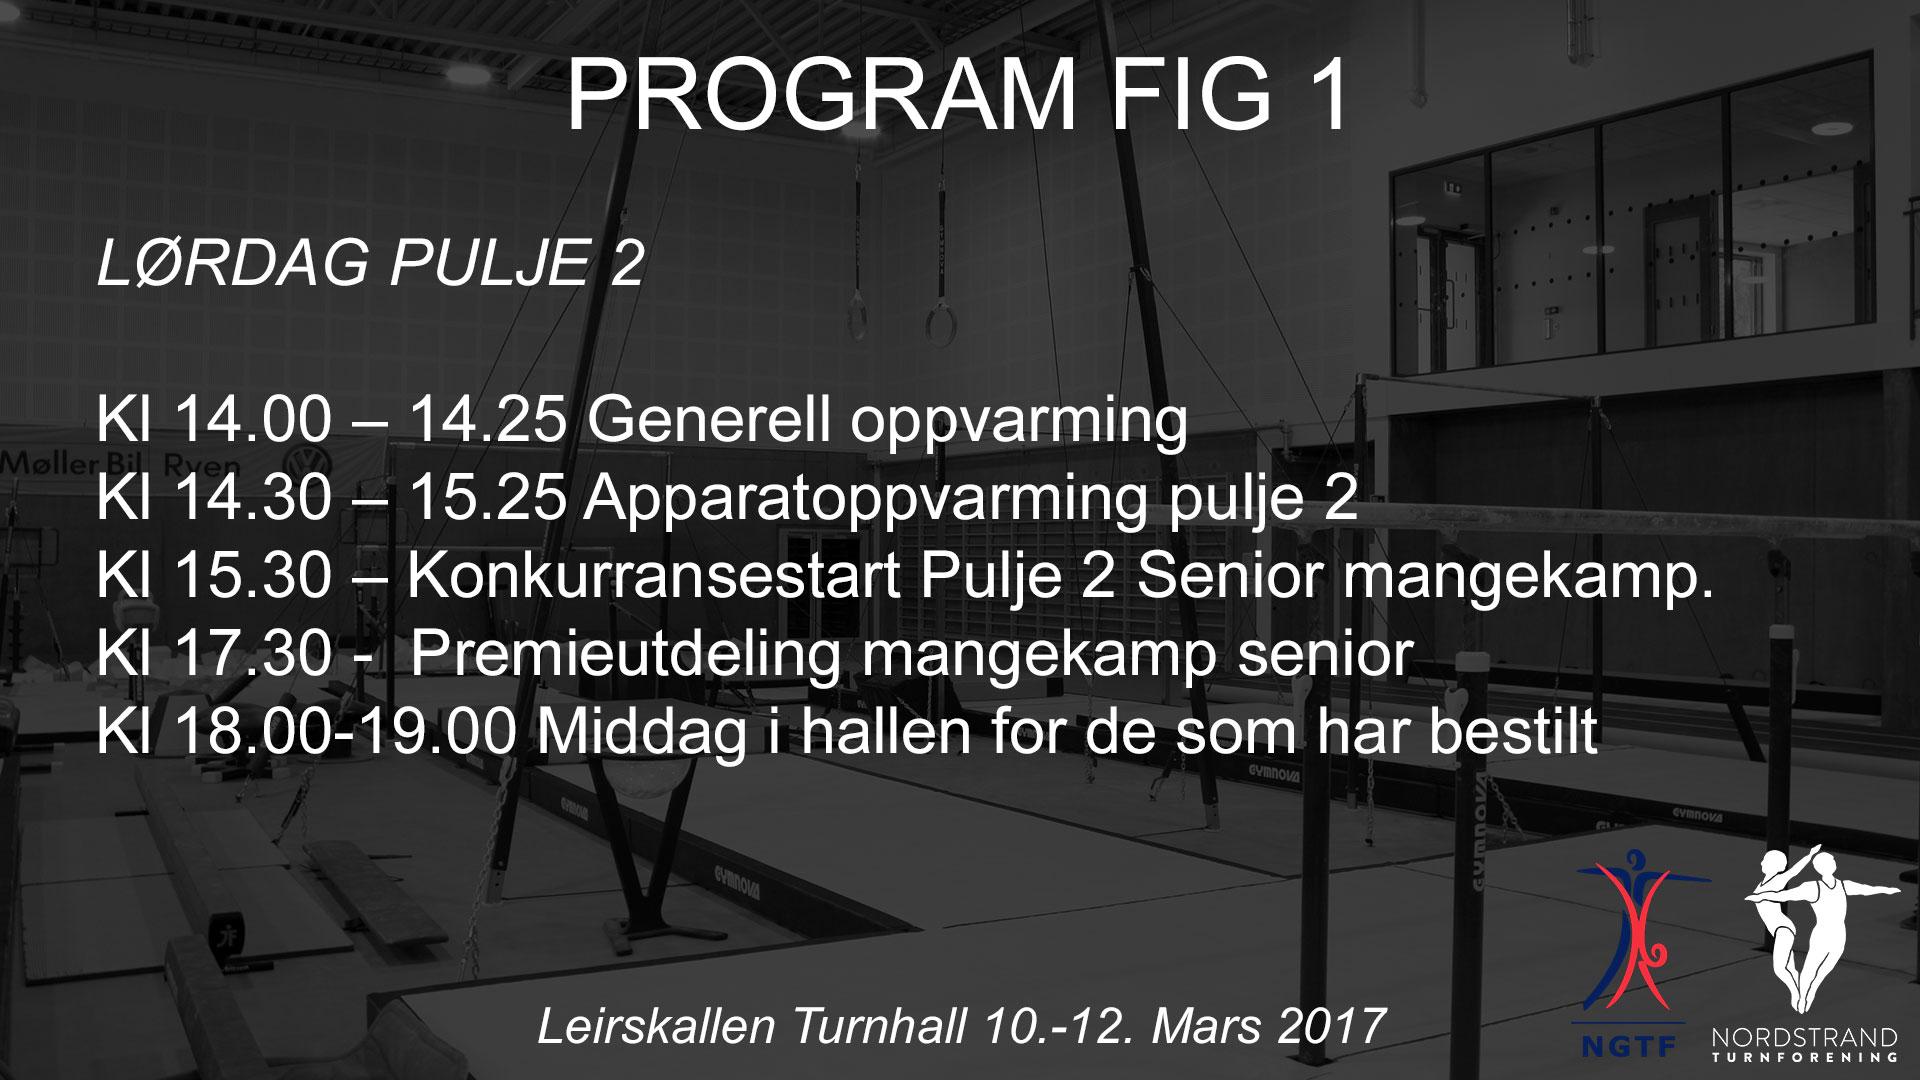 Program-FIG-1-Lørdag-Pulje-2.jpg